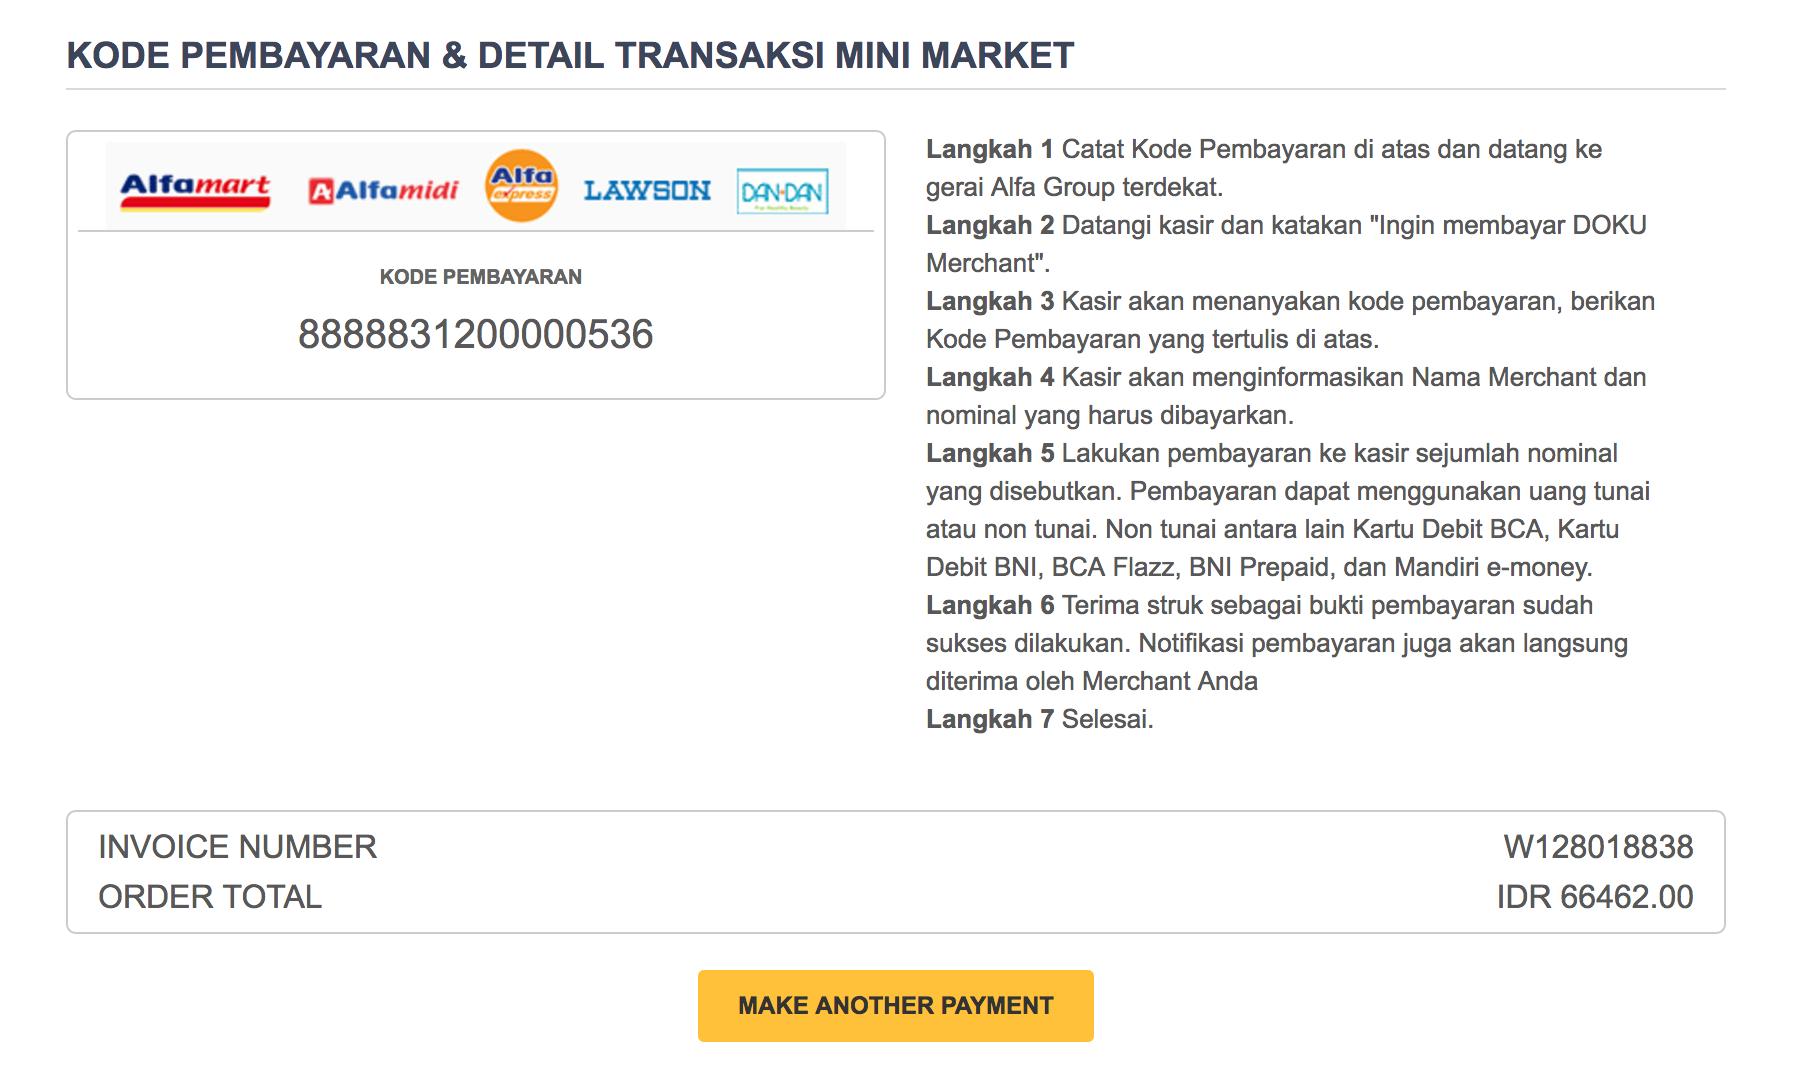 Minimart invoice